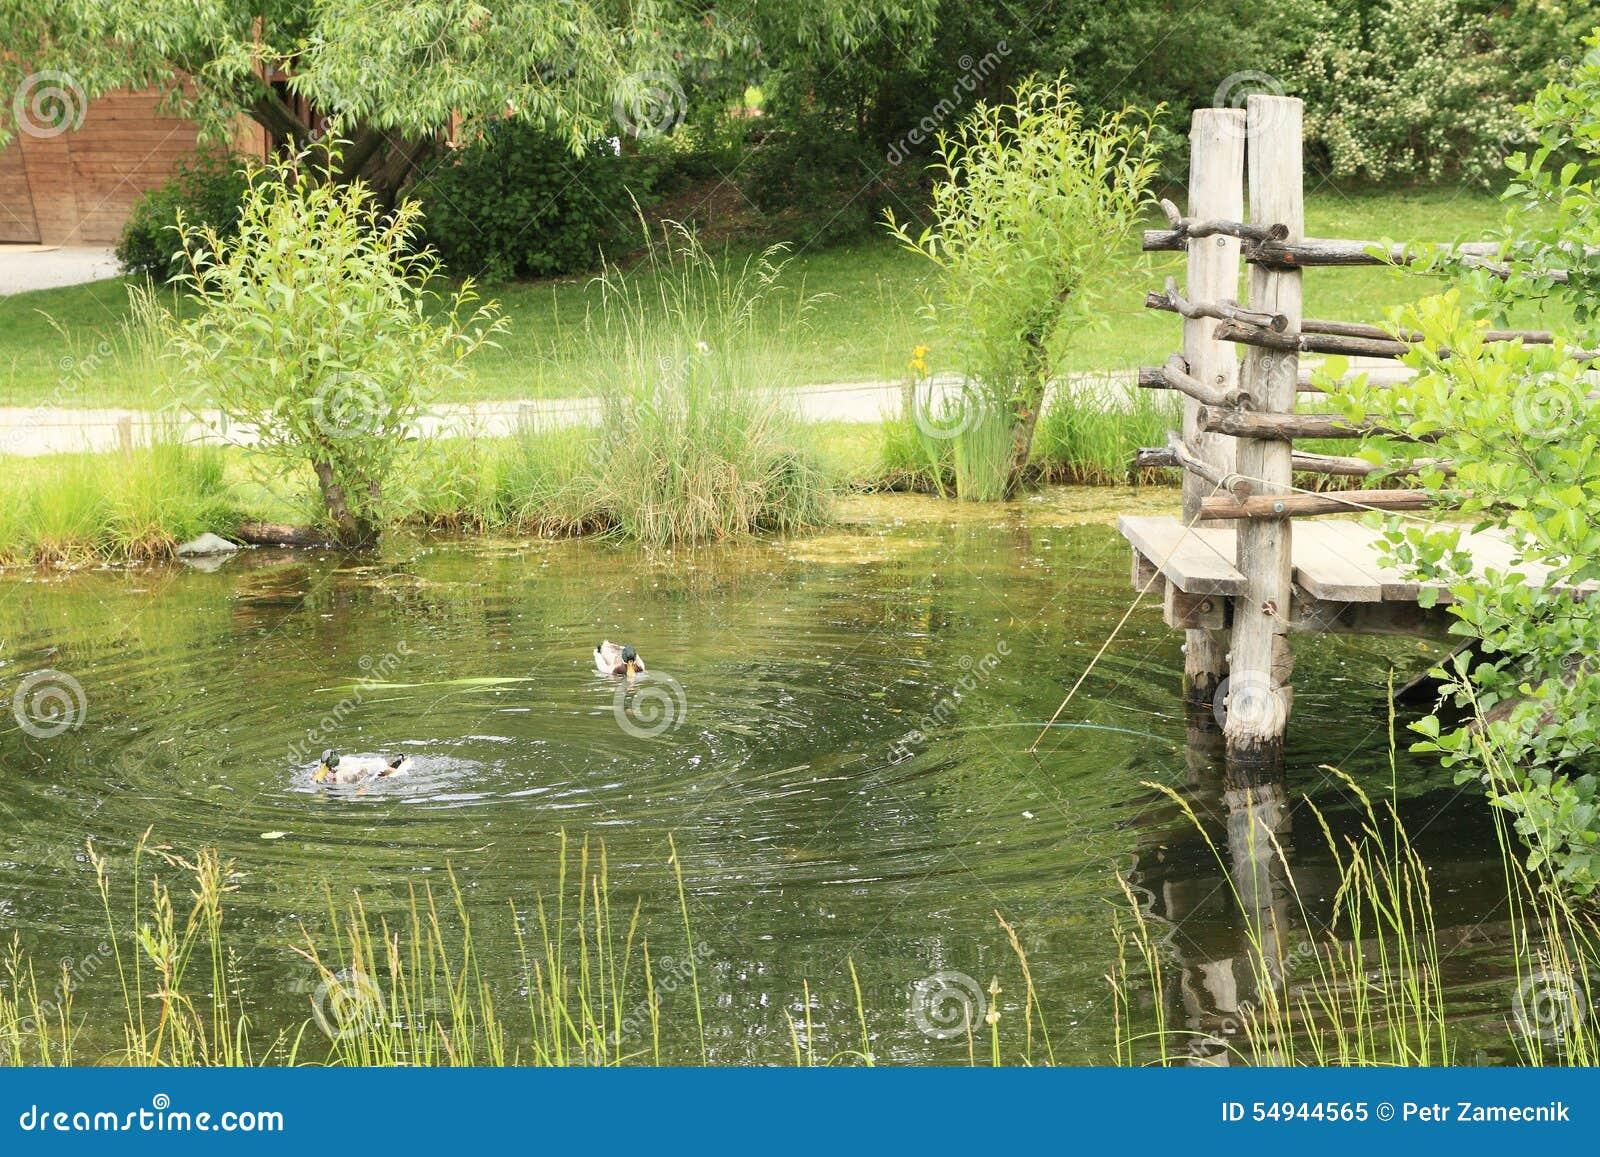 Ducks on pond stock image 20867827 for Pond dealers